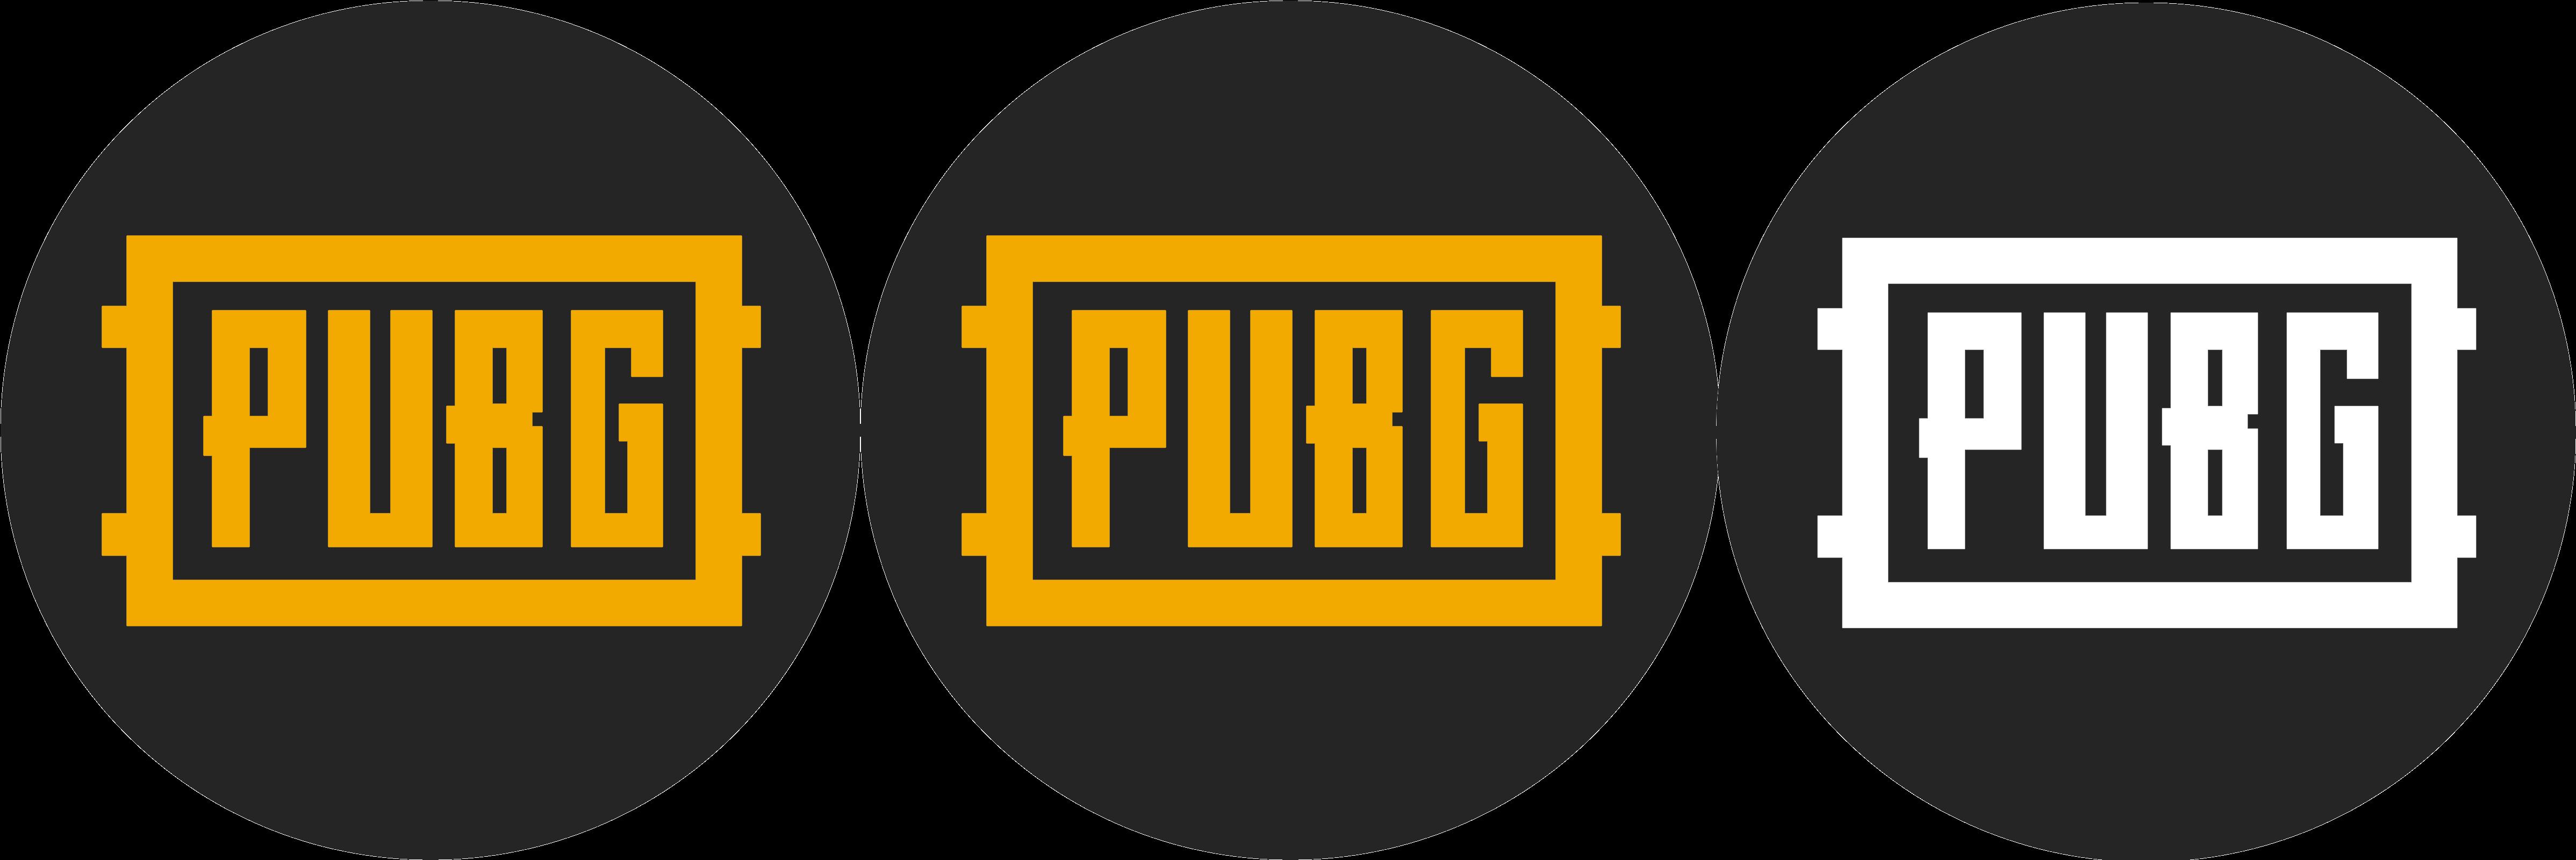 Playerunknown S Battlegrounds Original Pubg Circle Icon Png Full Size Png Download Seekpng